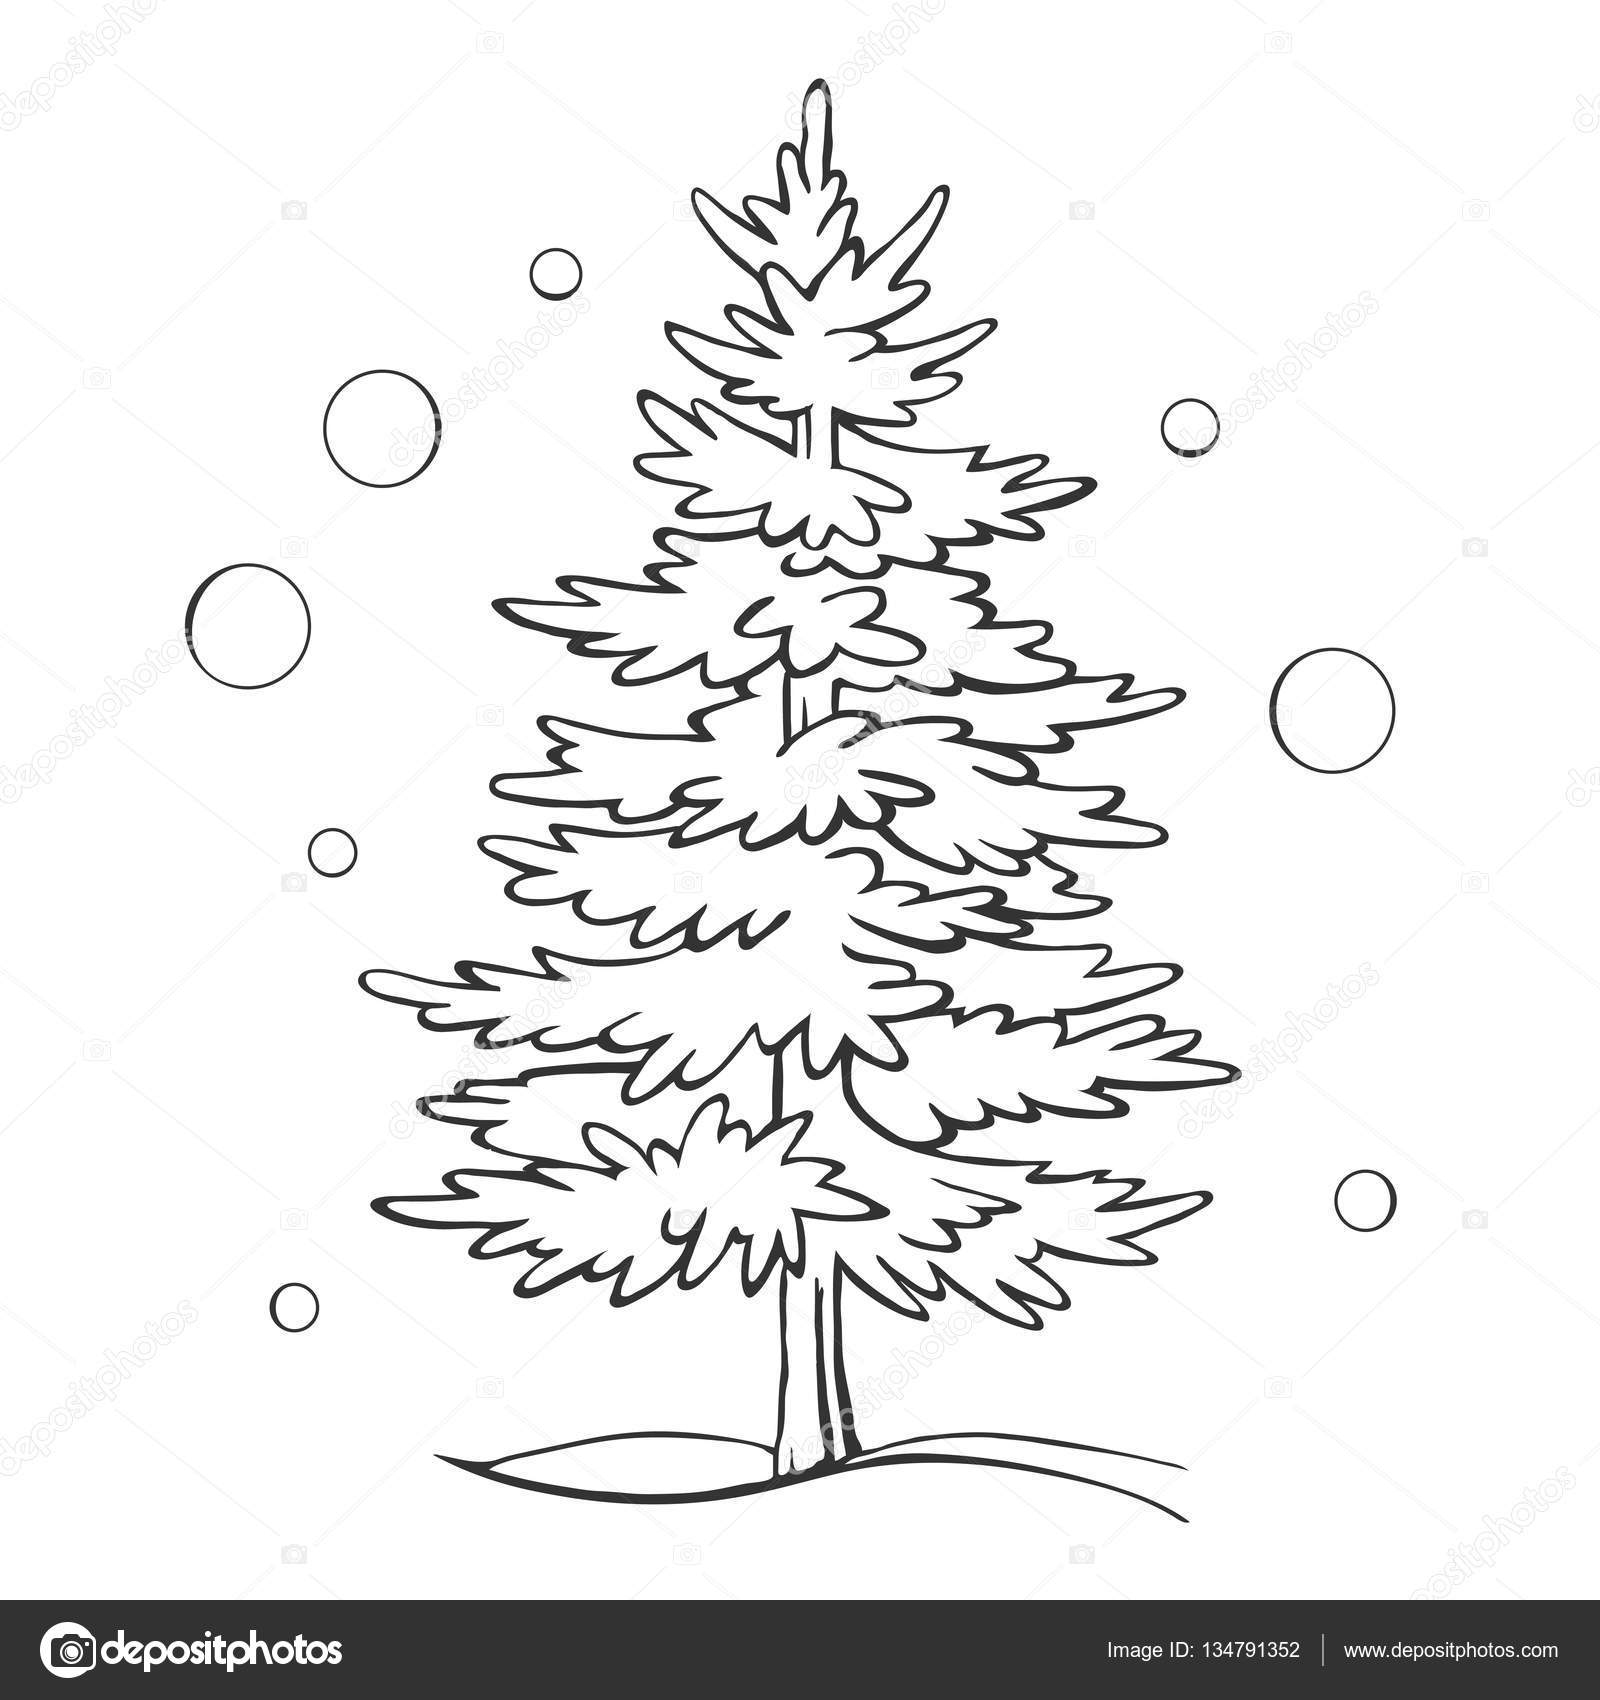 Drawing Christmas Tree Sketch.Christmas Tree Sketch Symbol Vector Xmas Winter Stock